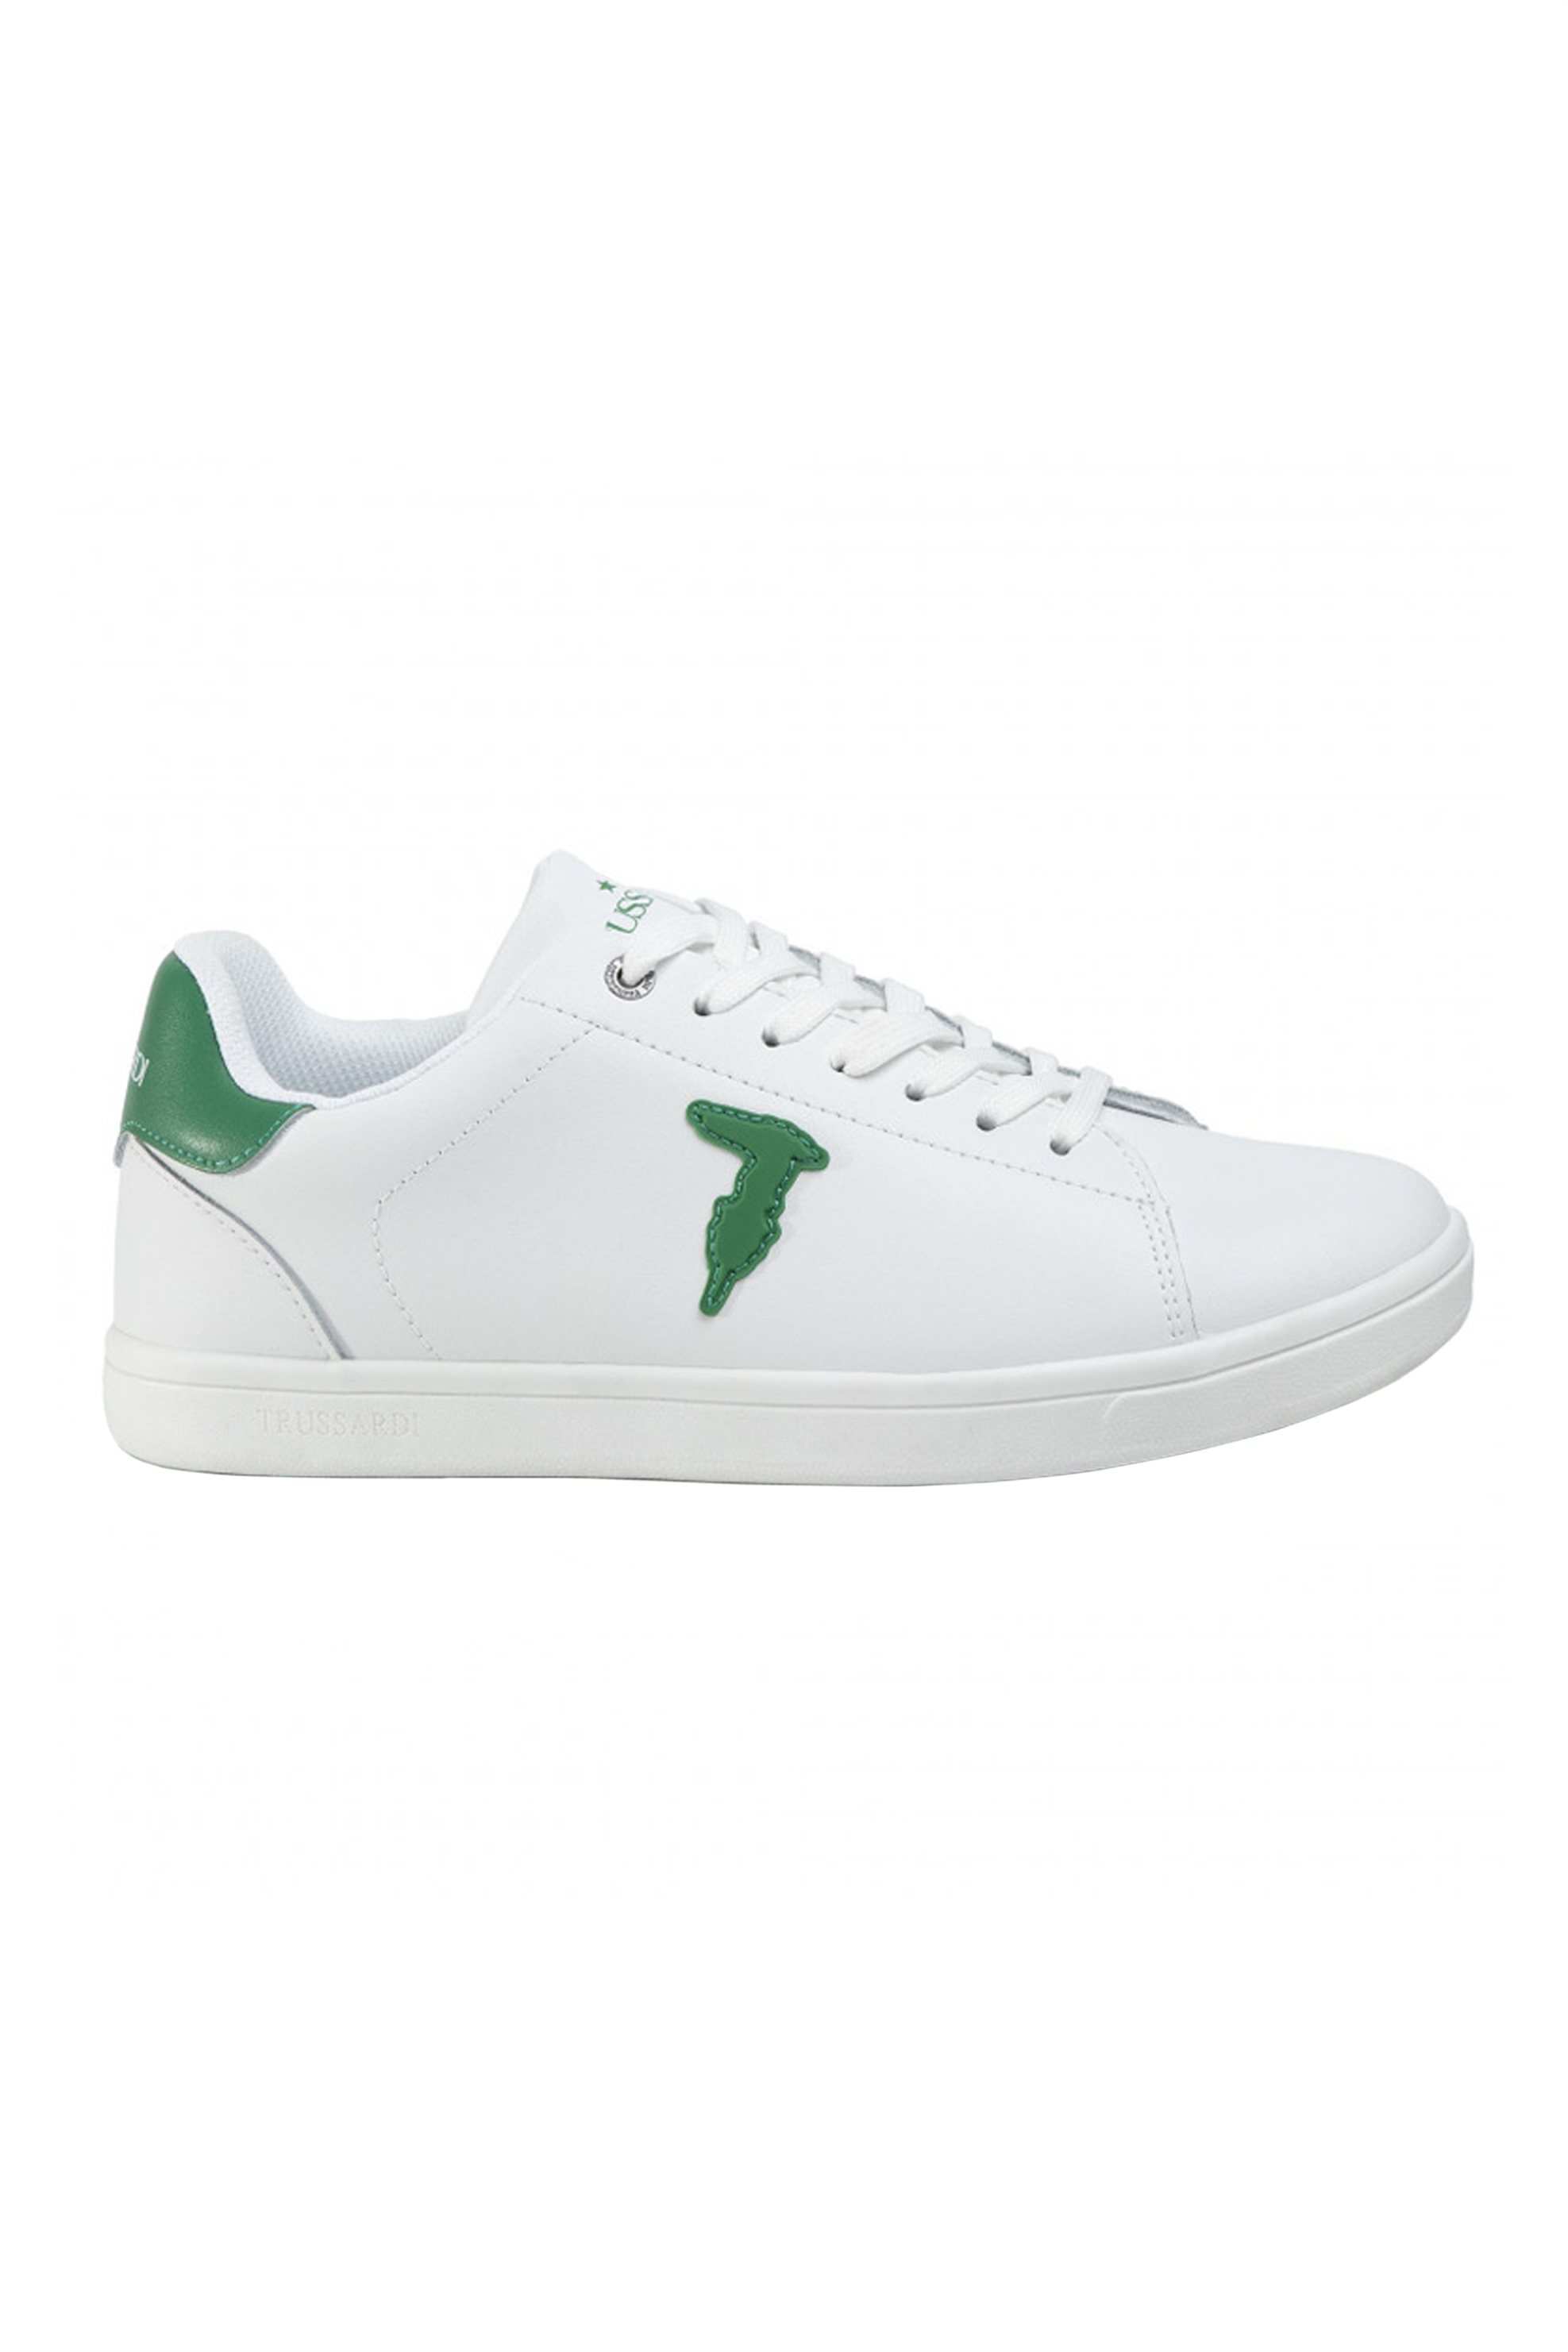 Trussardi ανδρικά sneakers με κορδόνια και logo patch – 77A00241-9Y099999 – Πράσινο